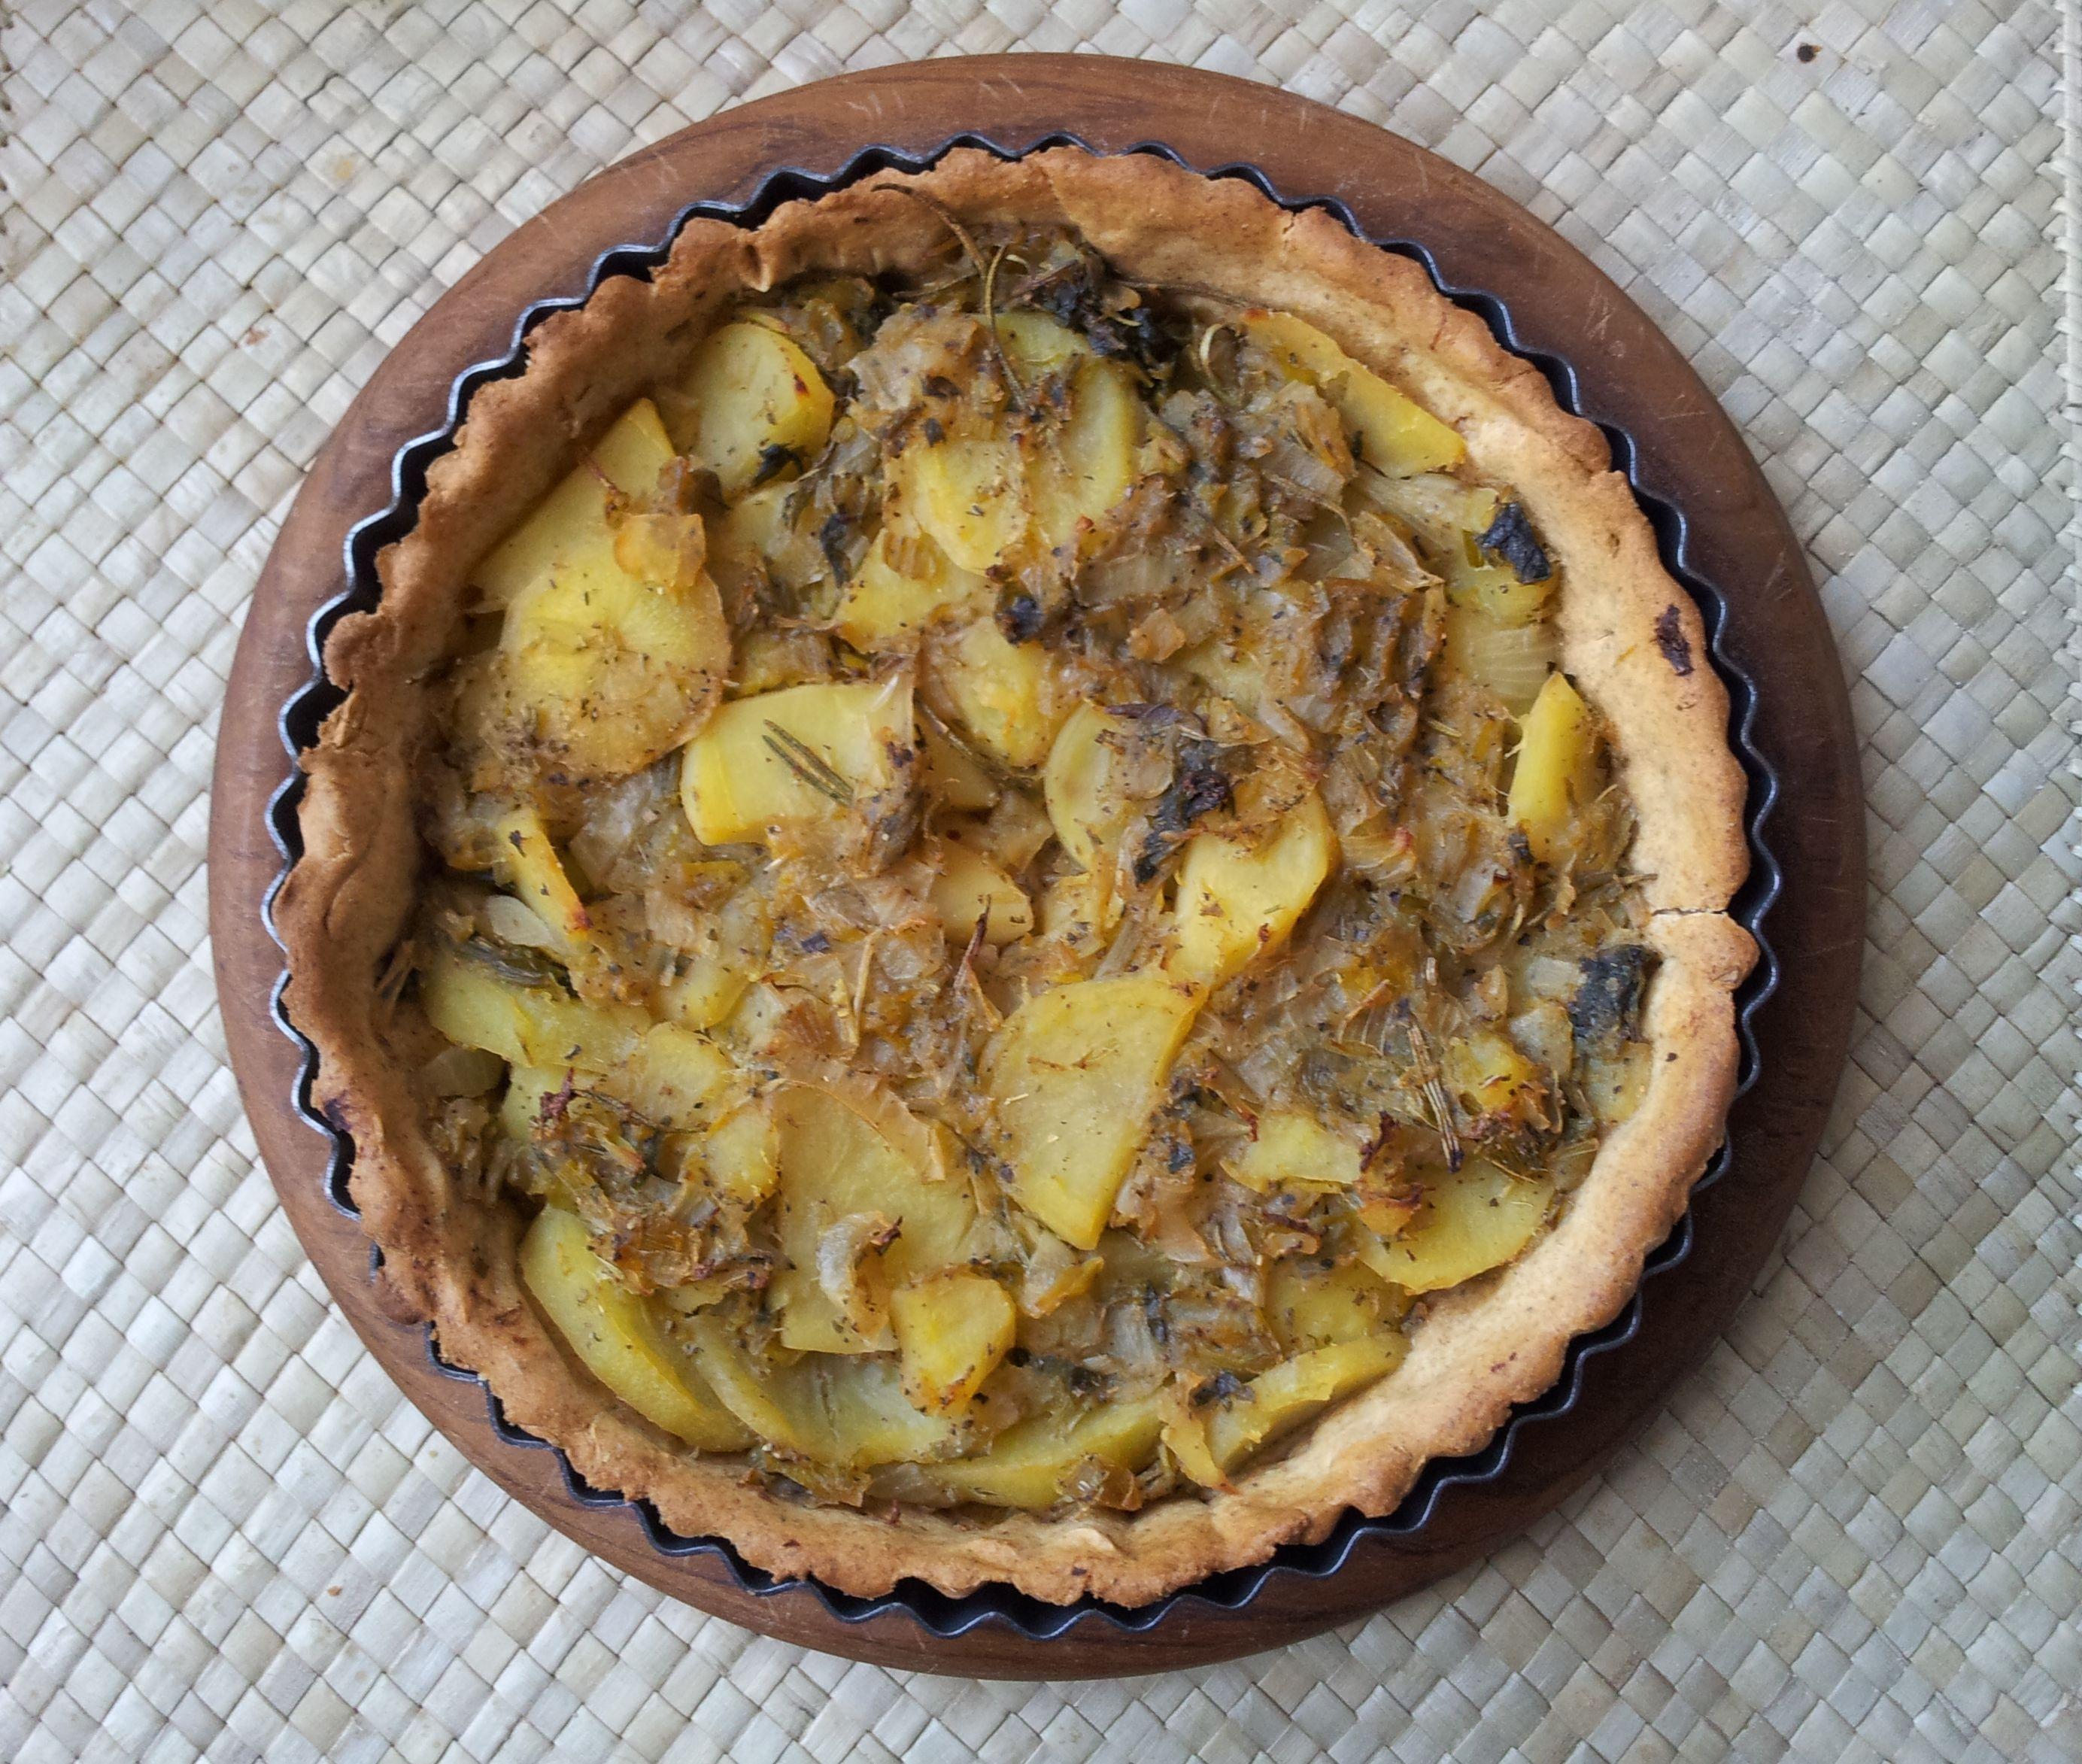 Potatoes, leek and cabbage tart. #tart #leek #potatoes #cabbage #vegan #vegetables